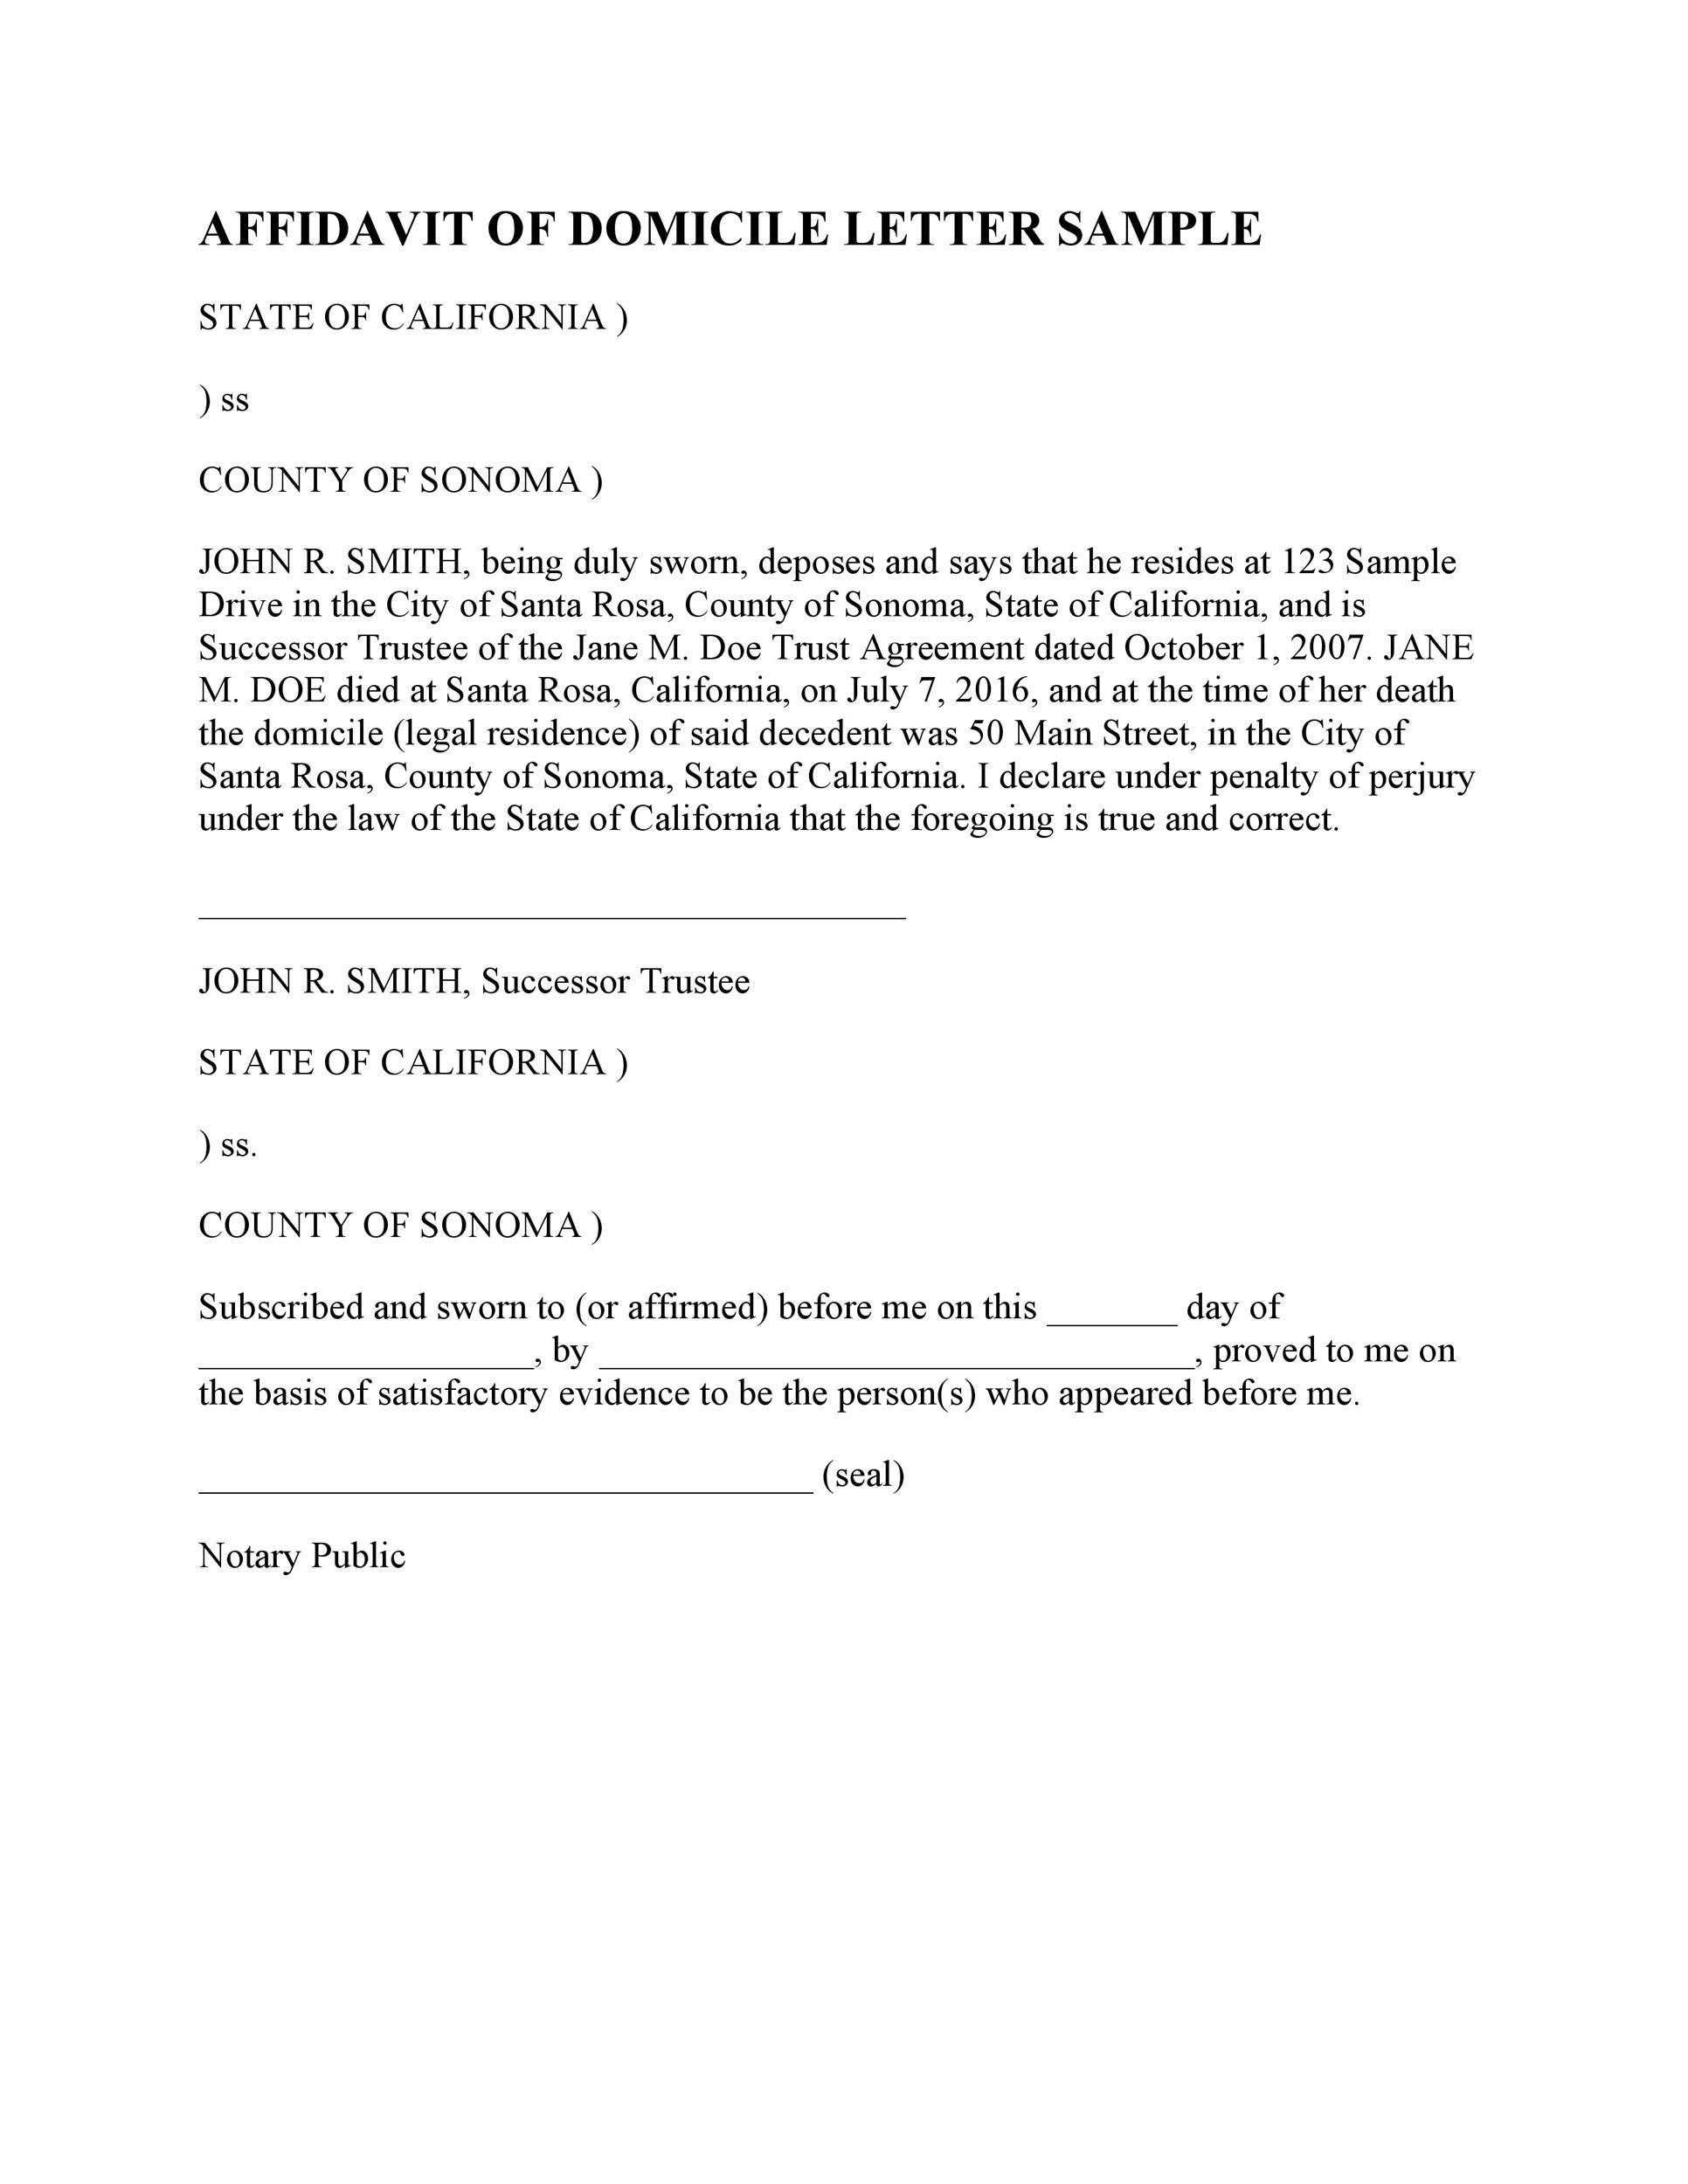 Free affidavit of domicile 48